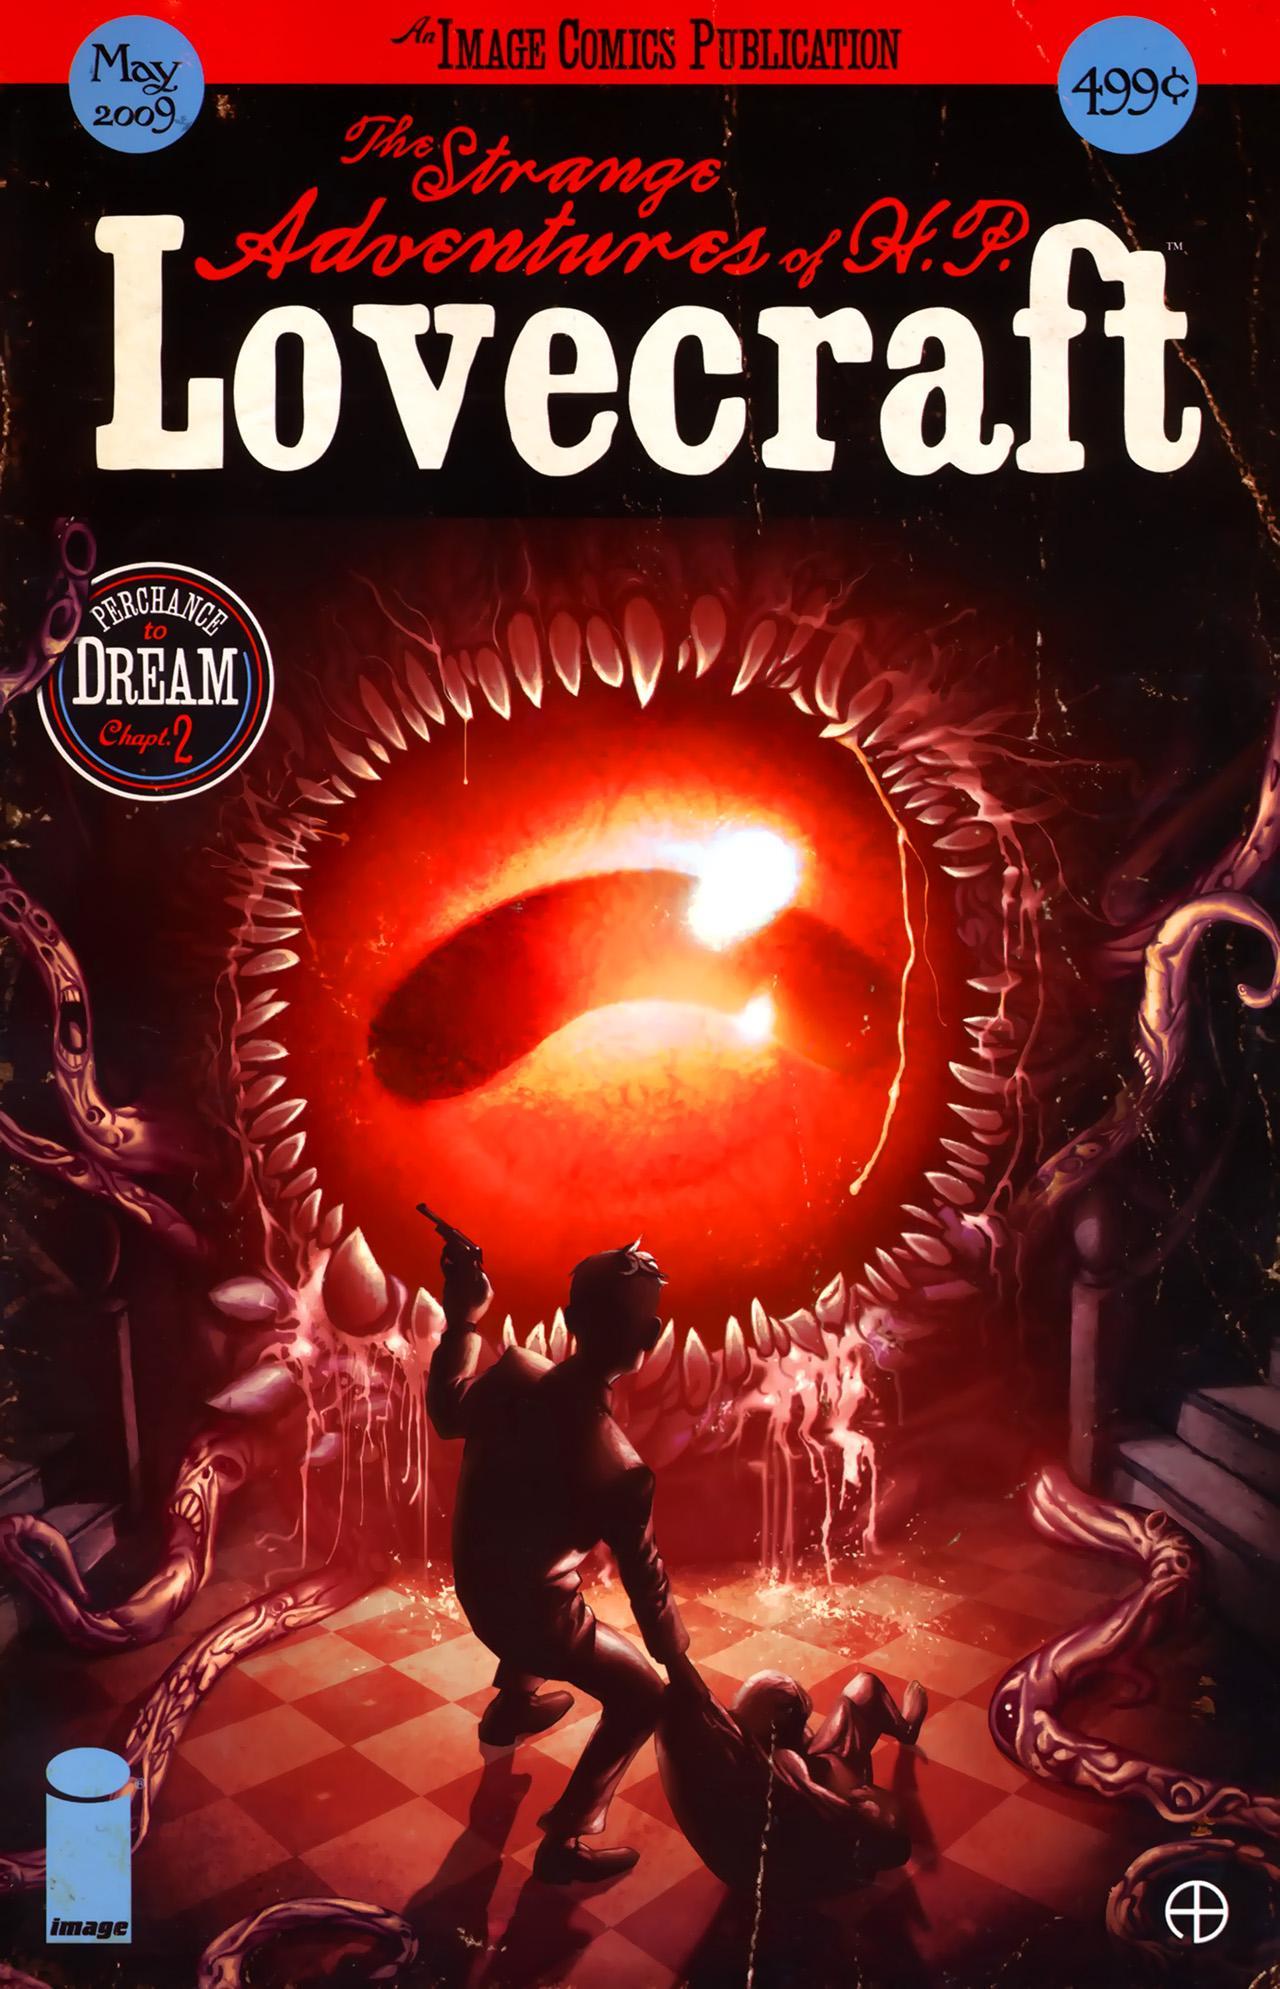 The Strange Adventures of H.P. Lovecraft #2